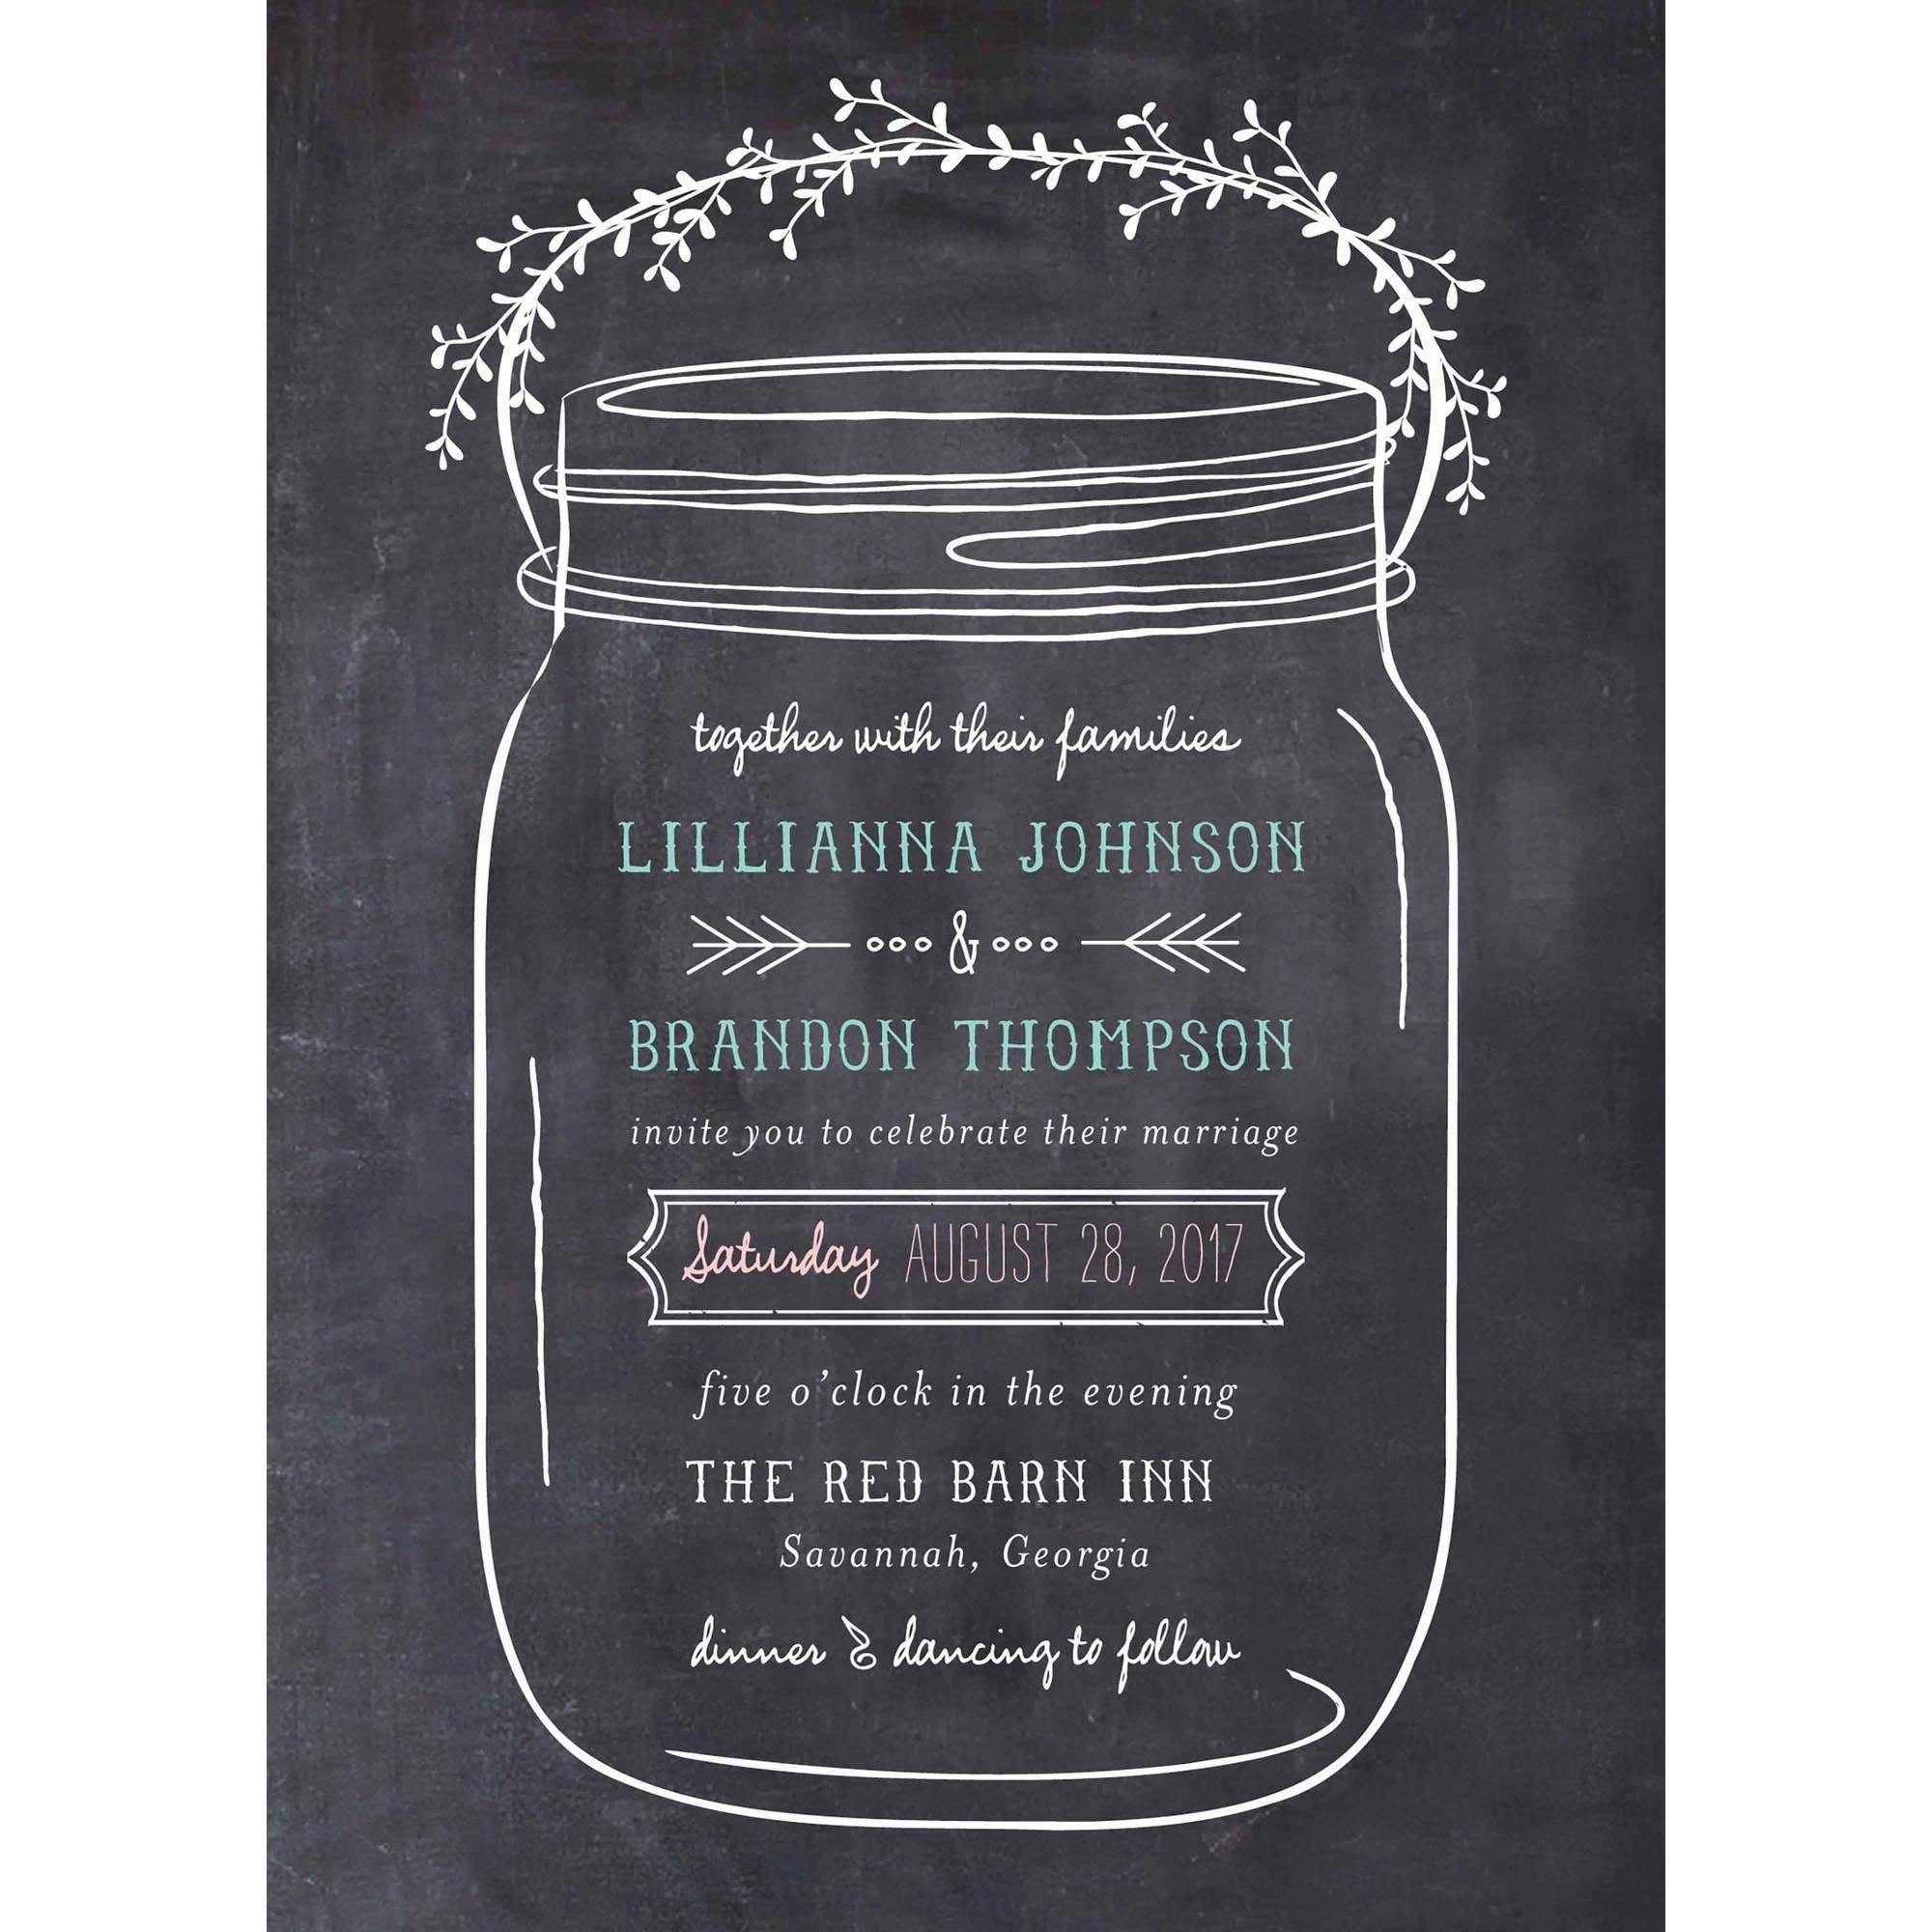 003 Staggering Mason Jar Invitation Template Photo  Free Wedding Shower RusticFull